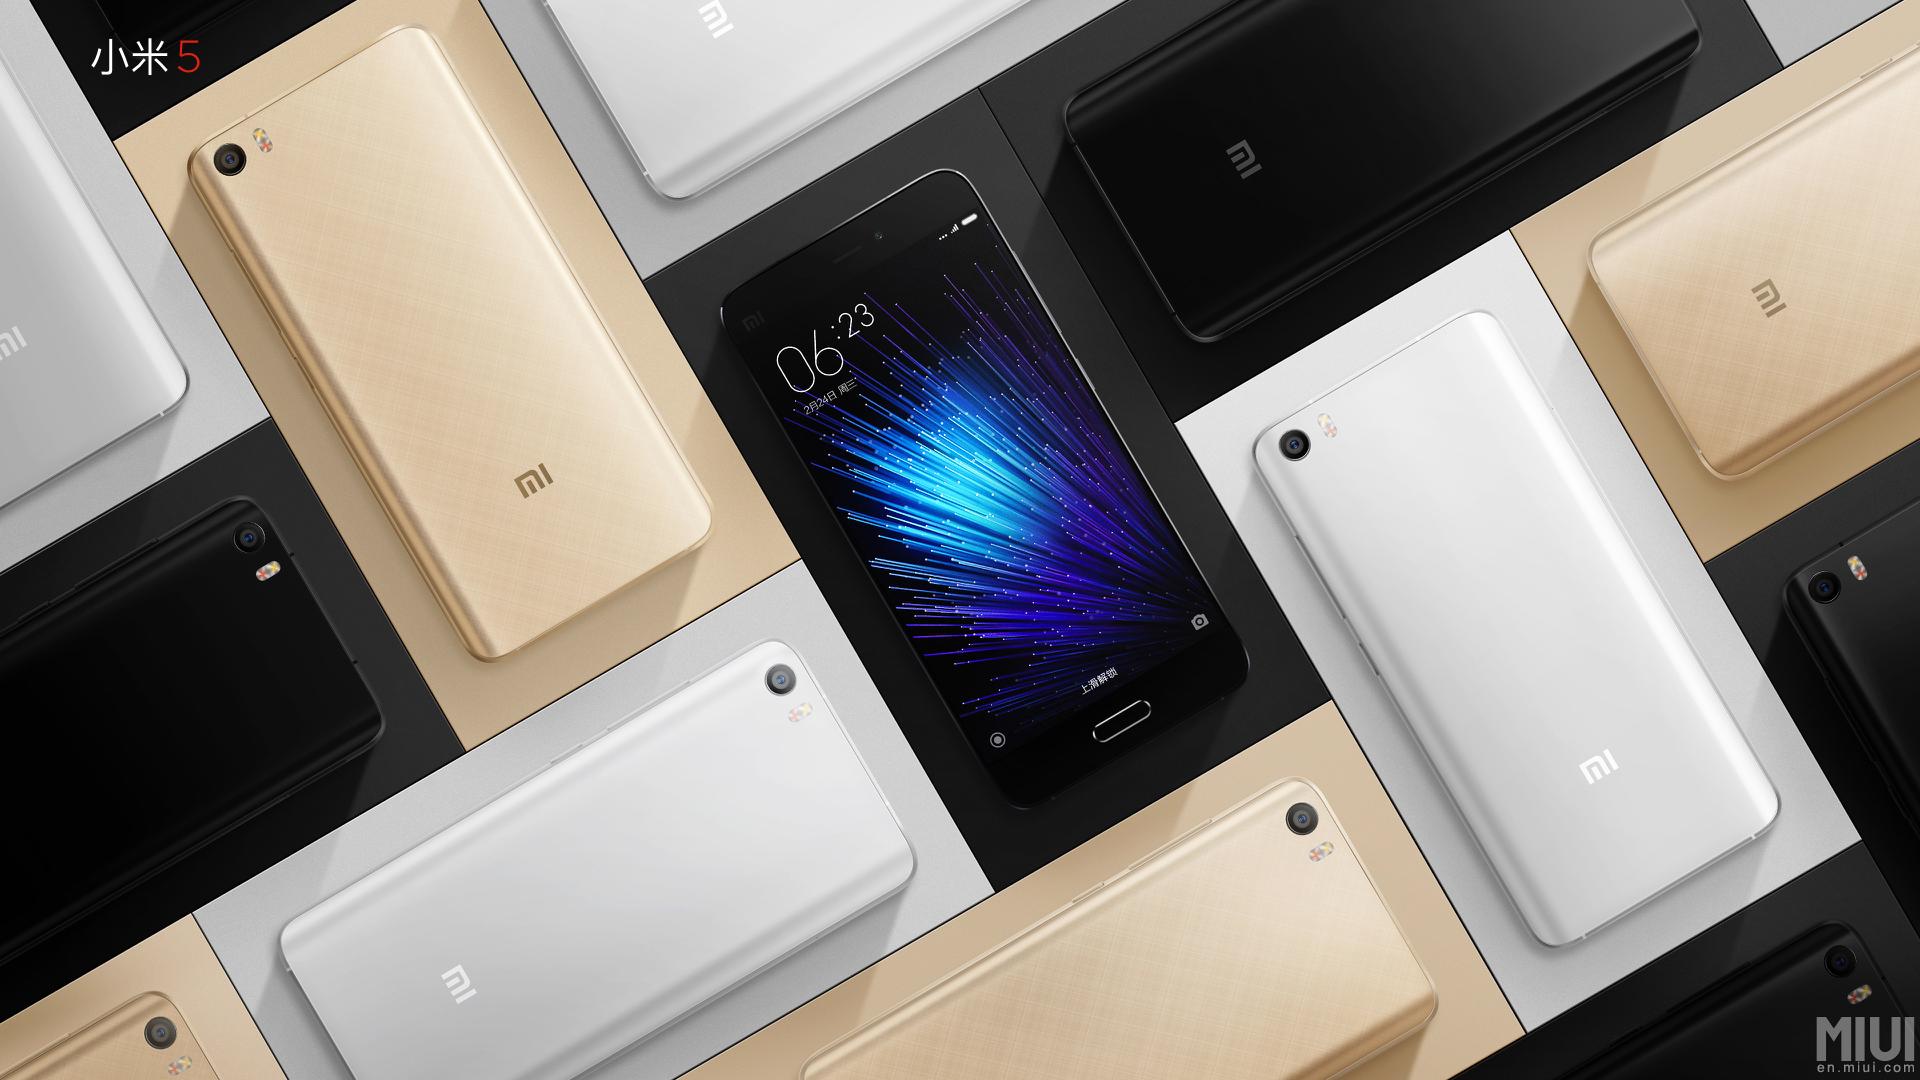 Xiaomi Mi5 and Mi5 PRO Design, Specs, Release Date and Price